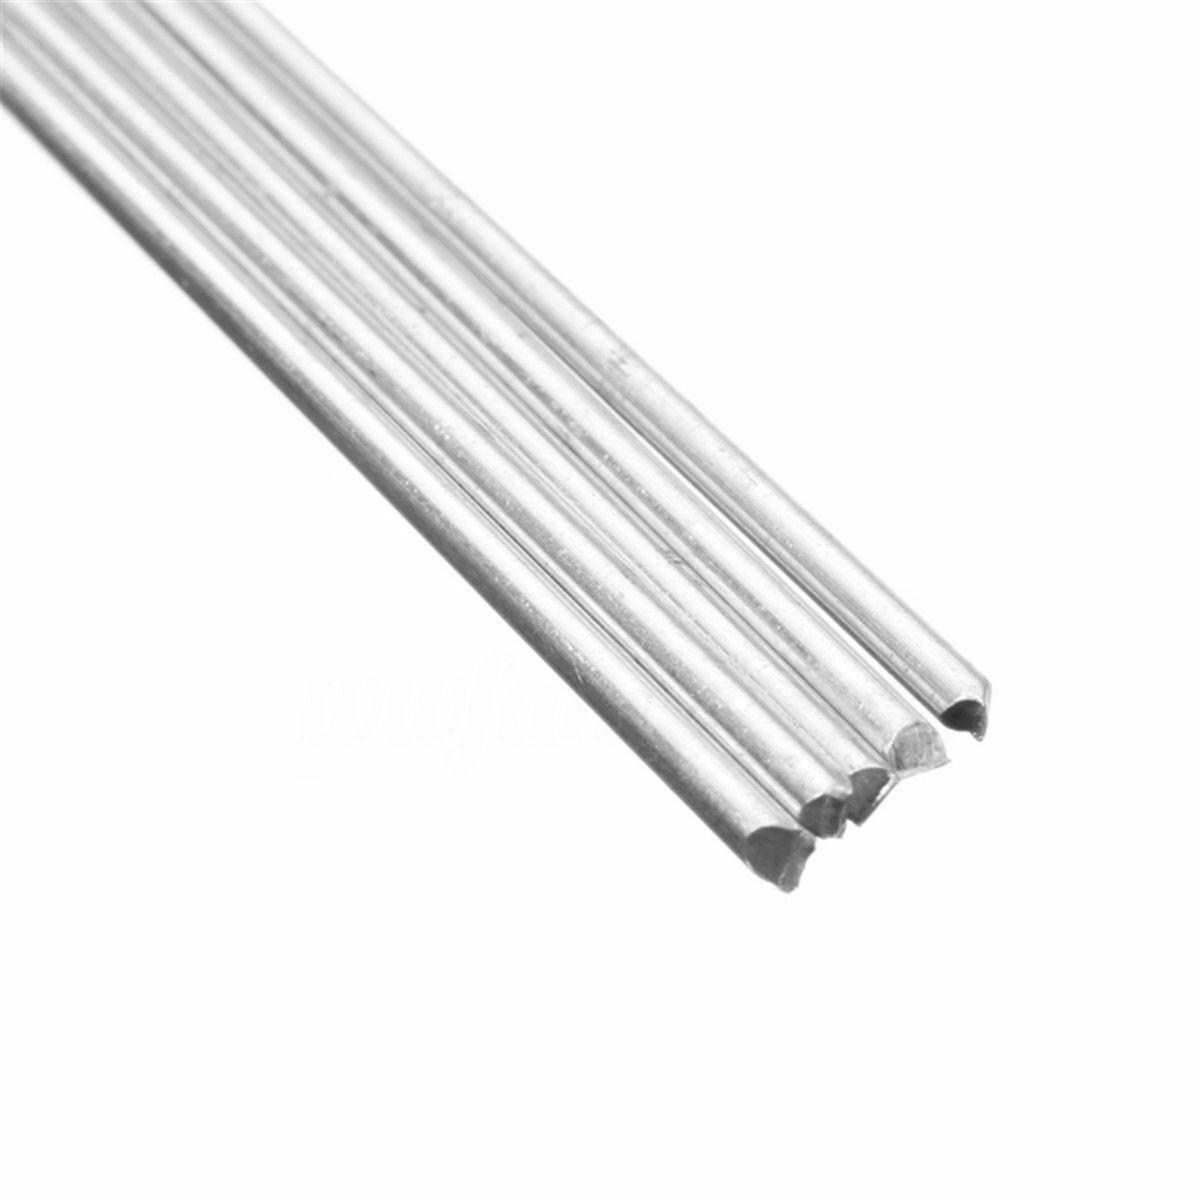 5~20pcs Low Temp Aluminum Alloy Silver Welding Brazing Solder Rod For Repair